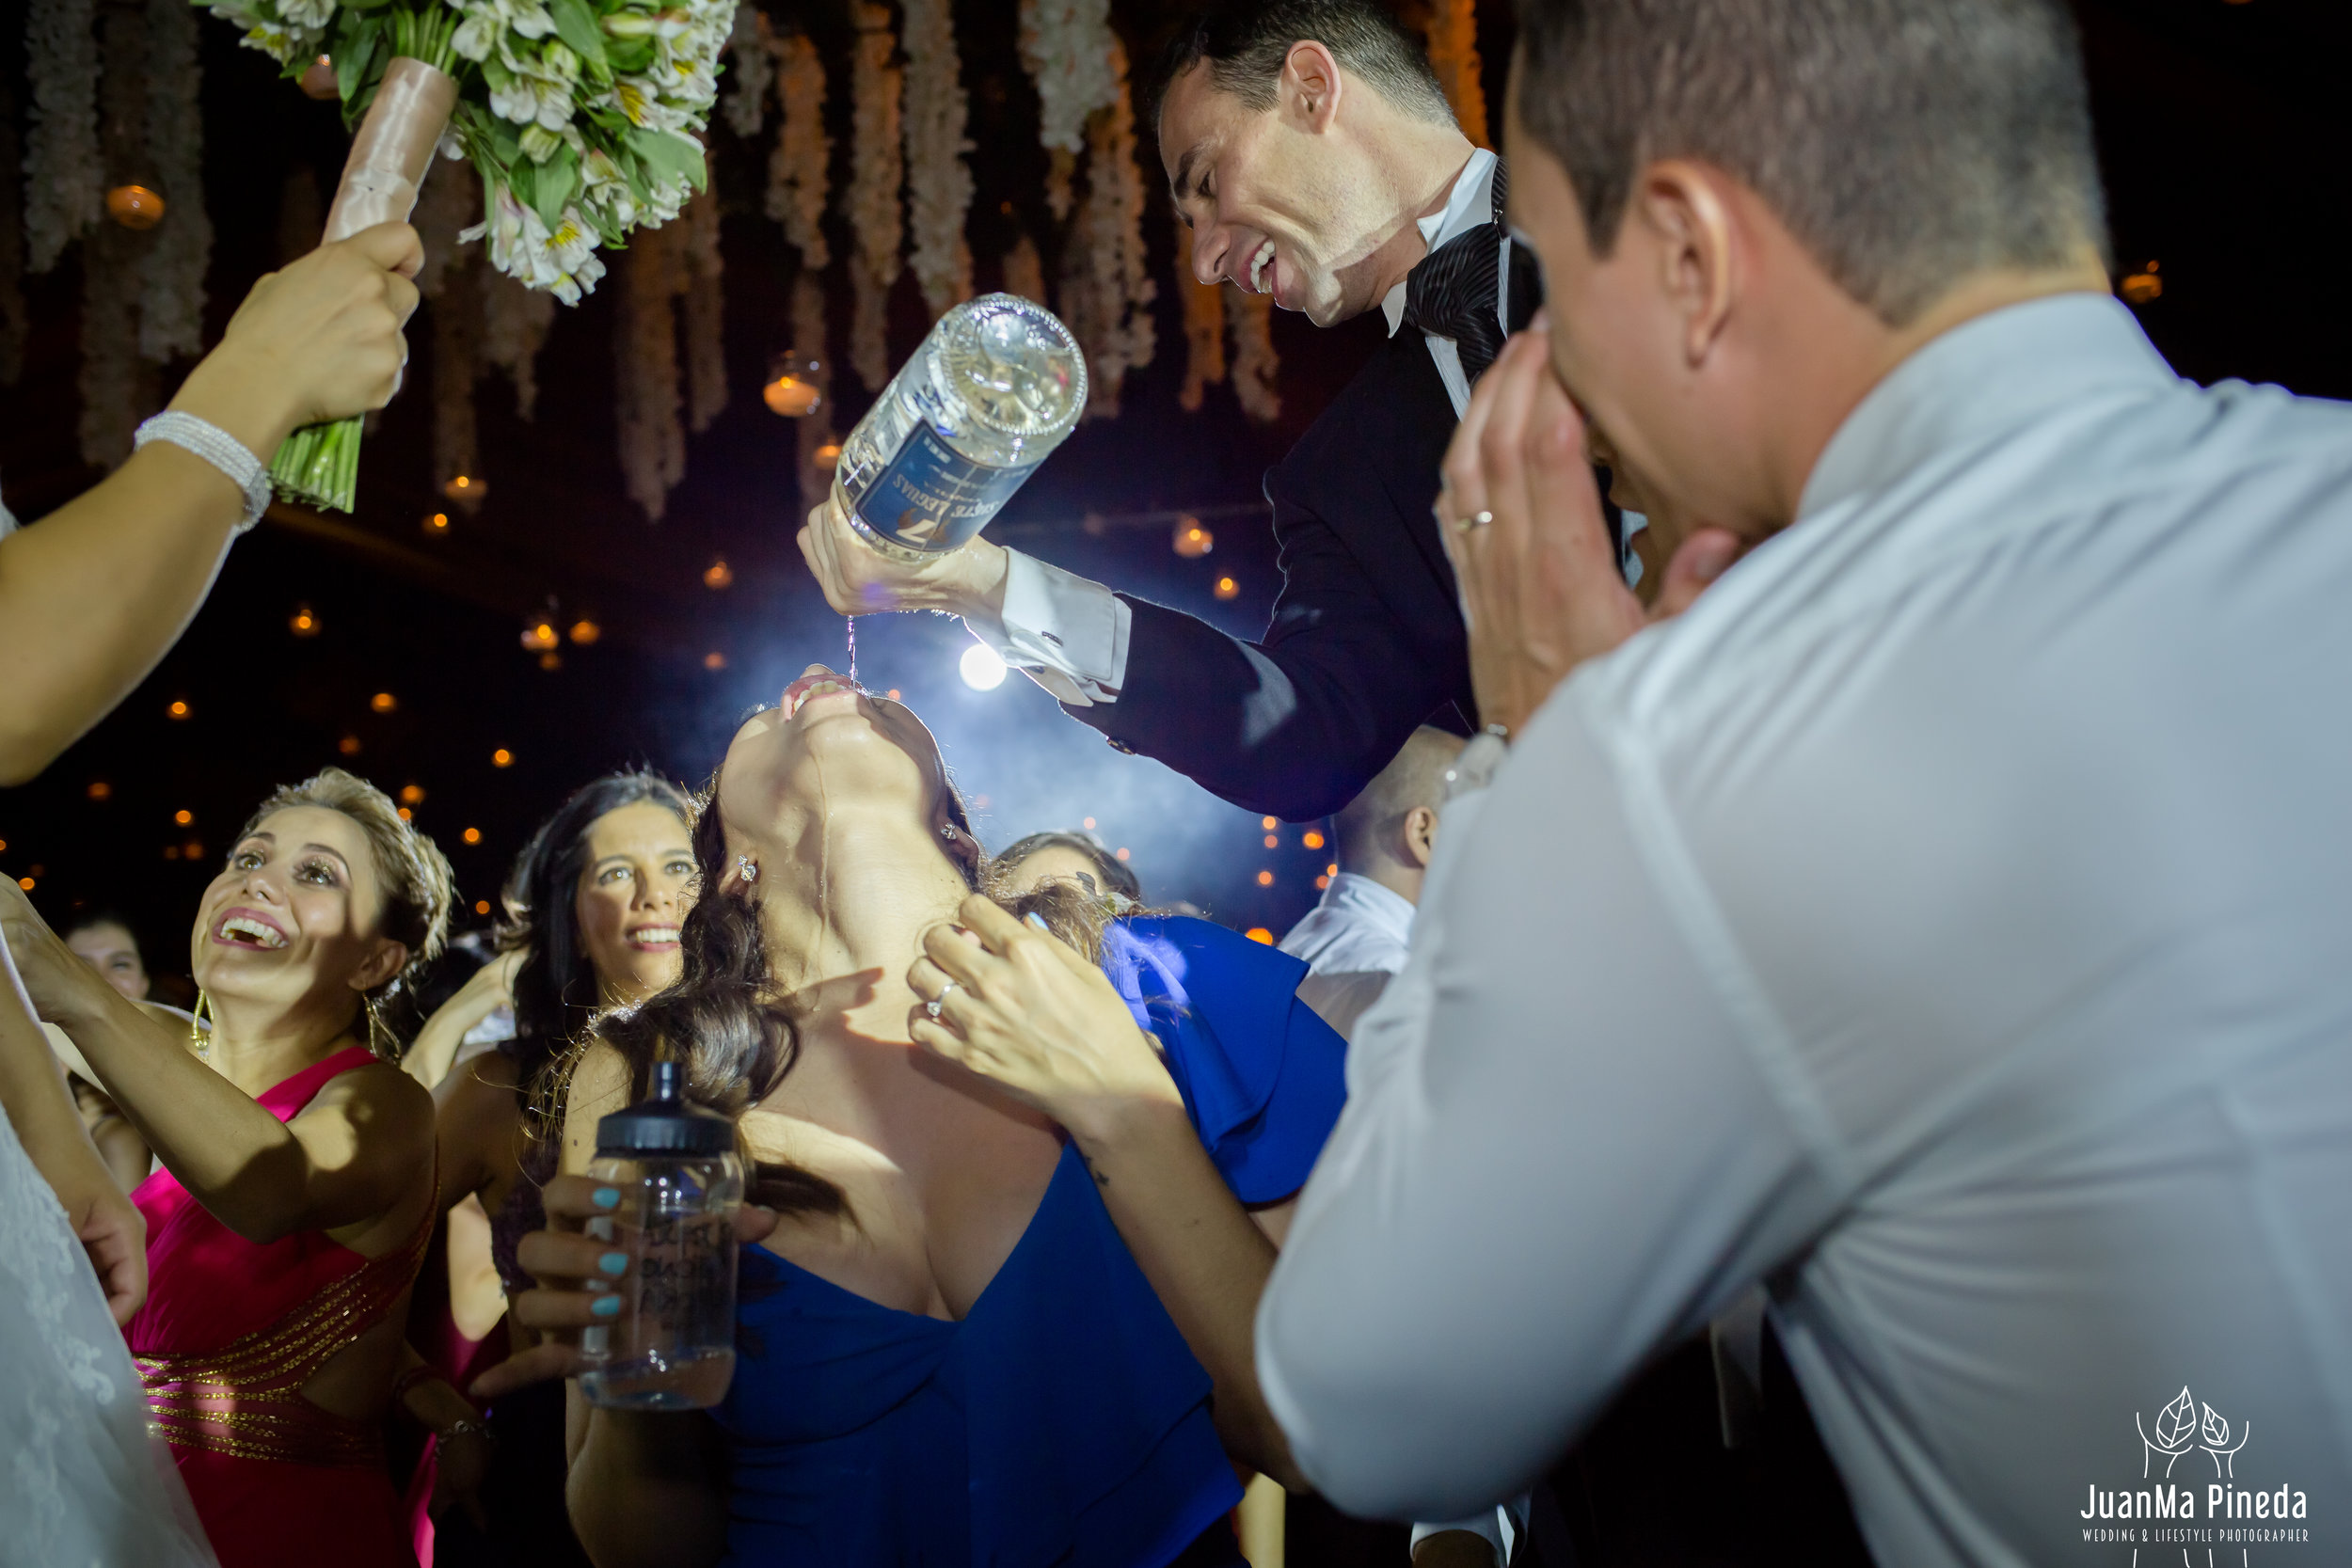 Wedding+Day+Photographer-1-10.jpg